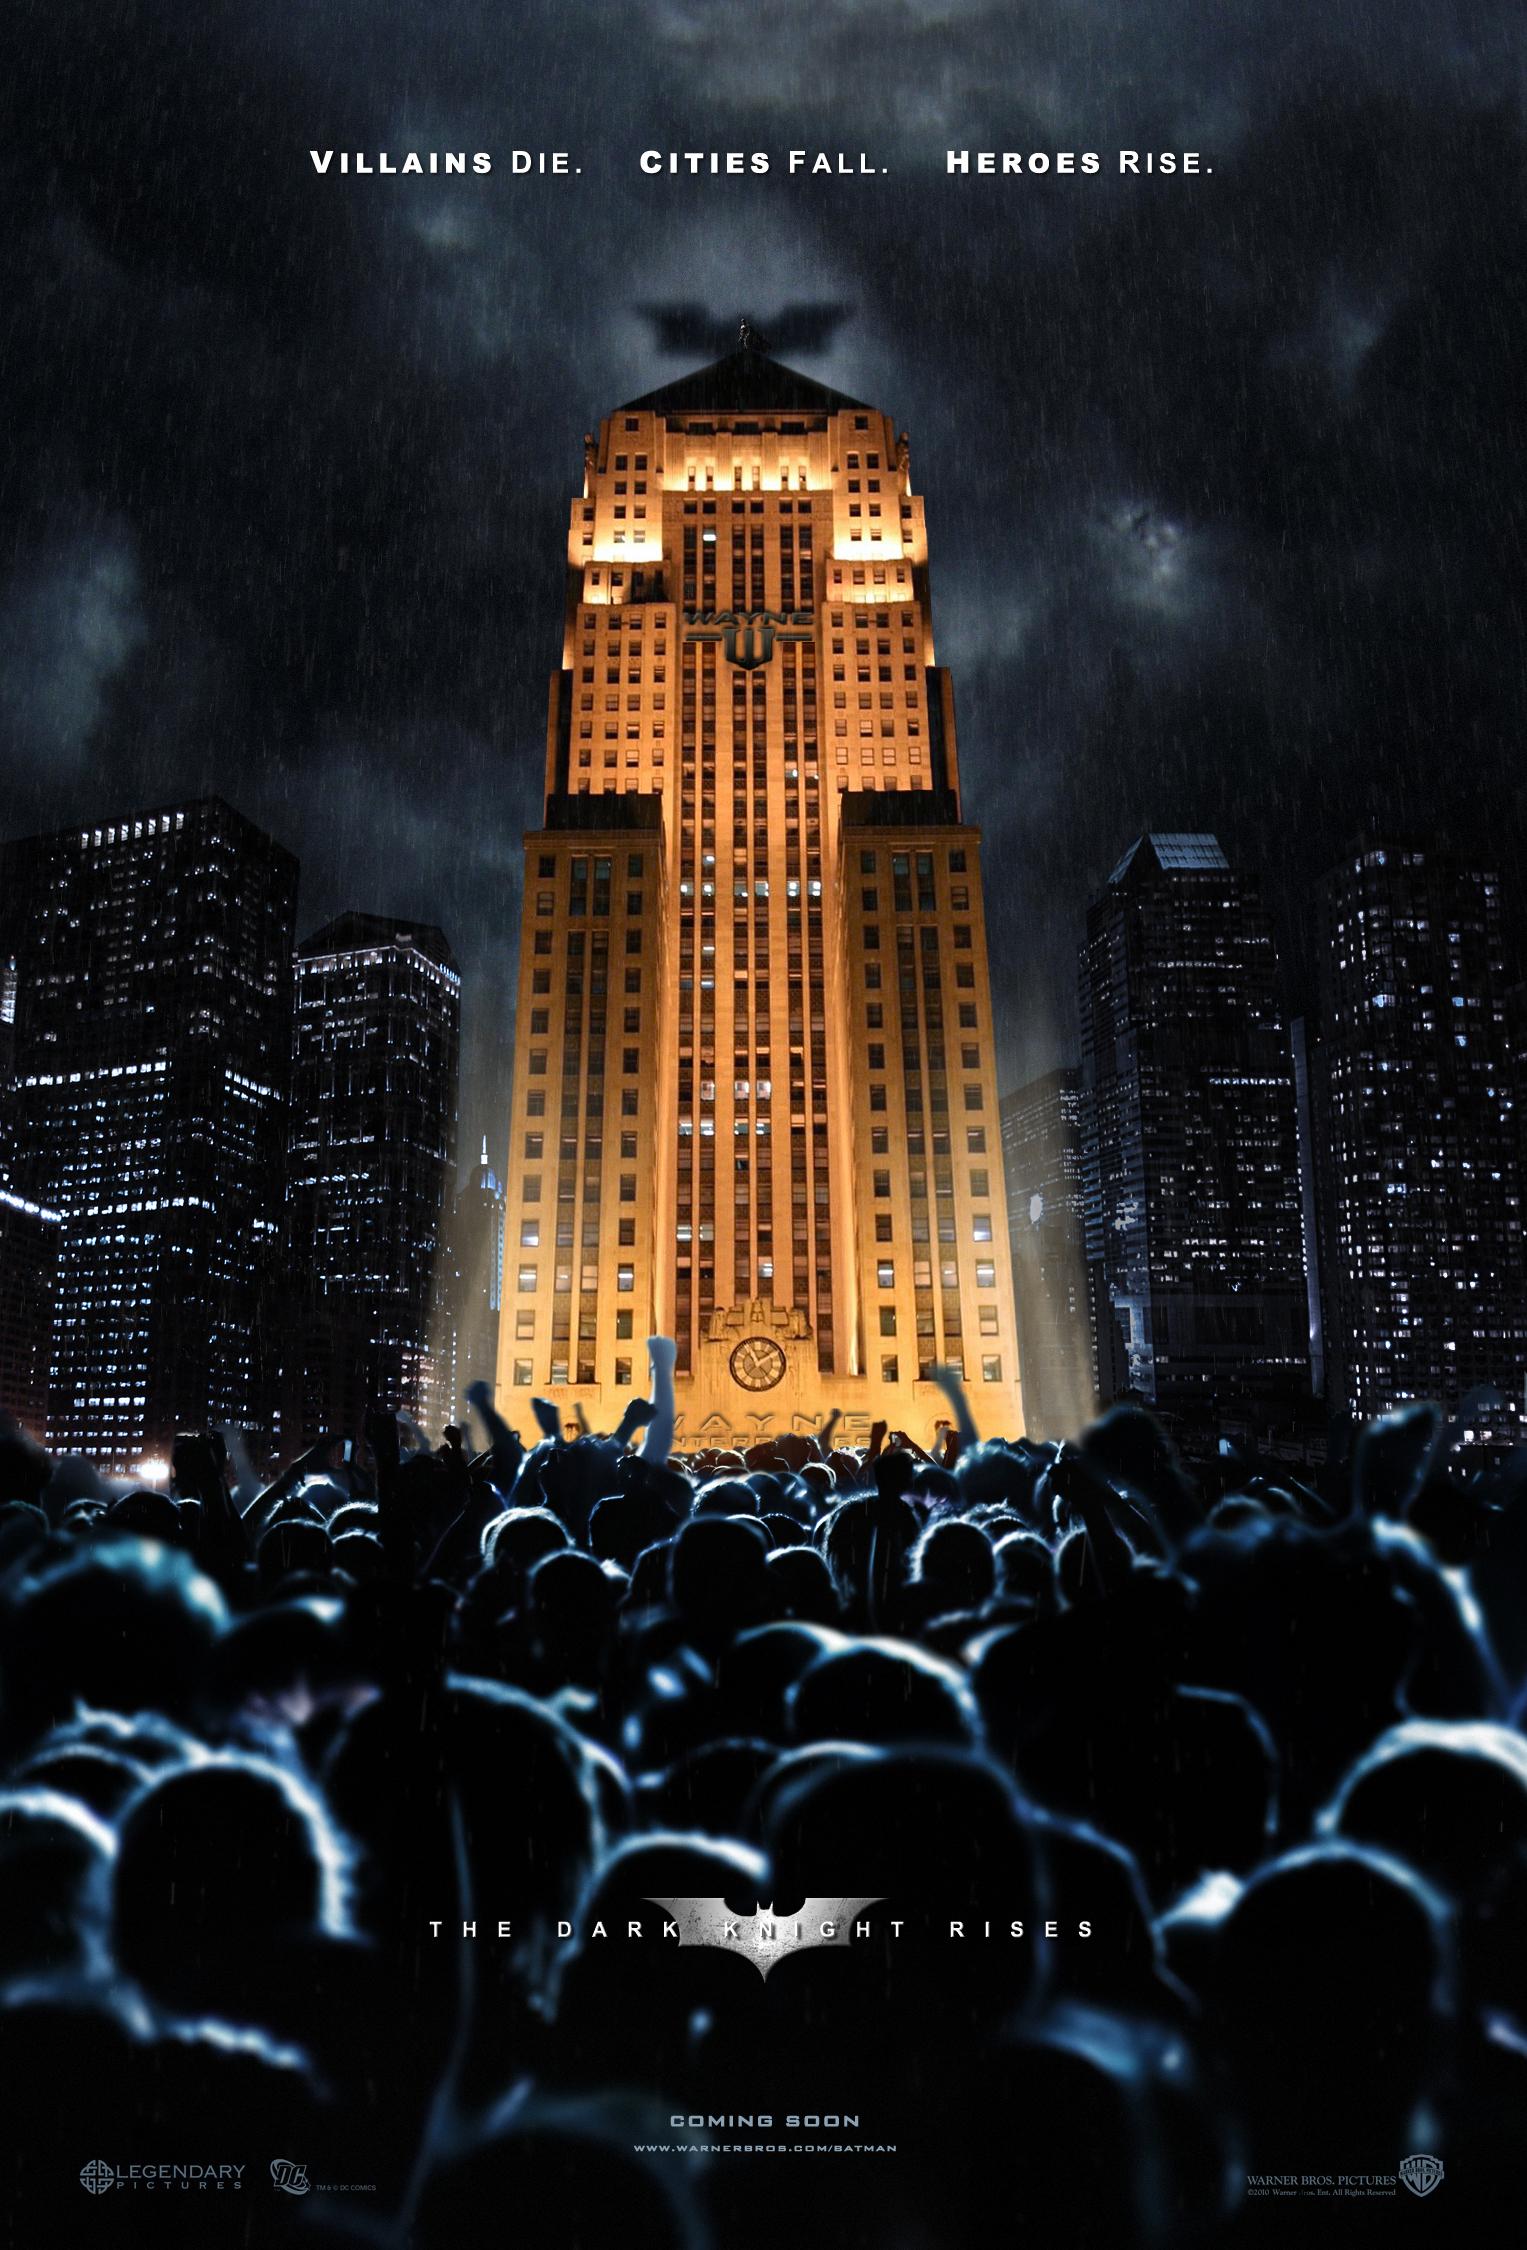 The Dark Knight Rises - Movie Poster #4 (Original)